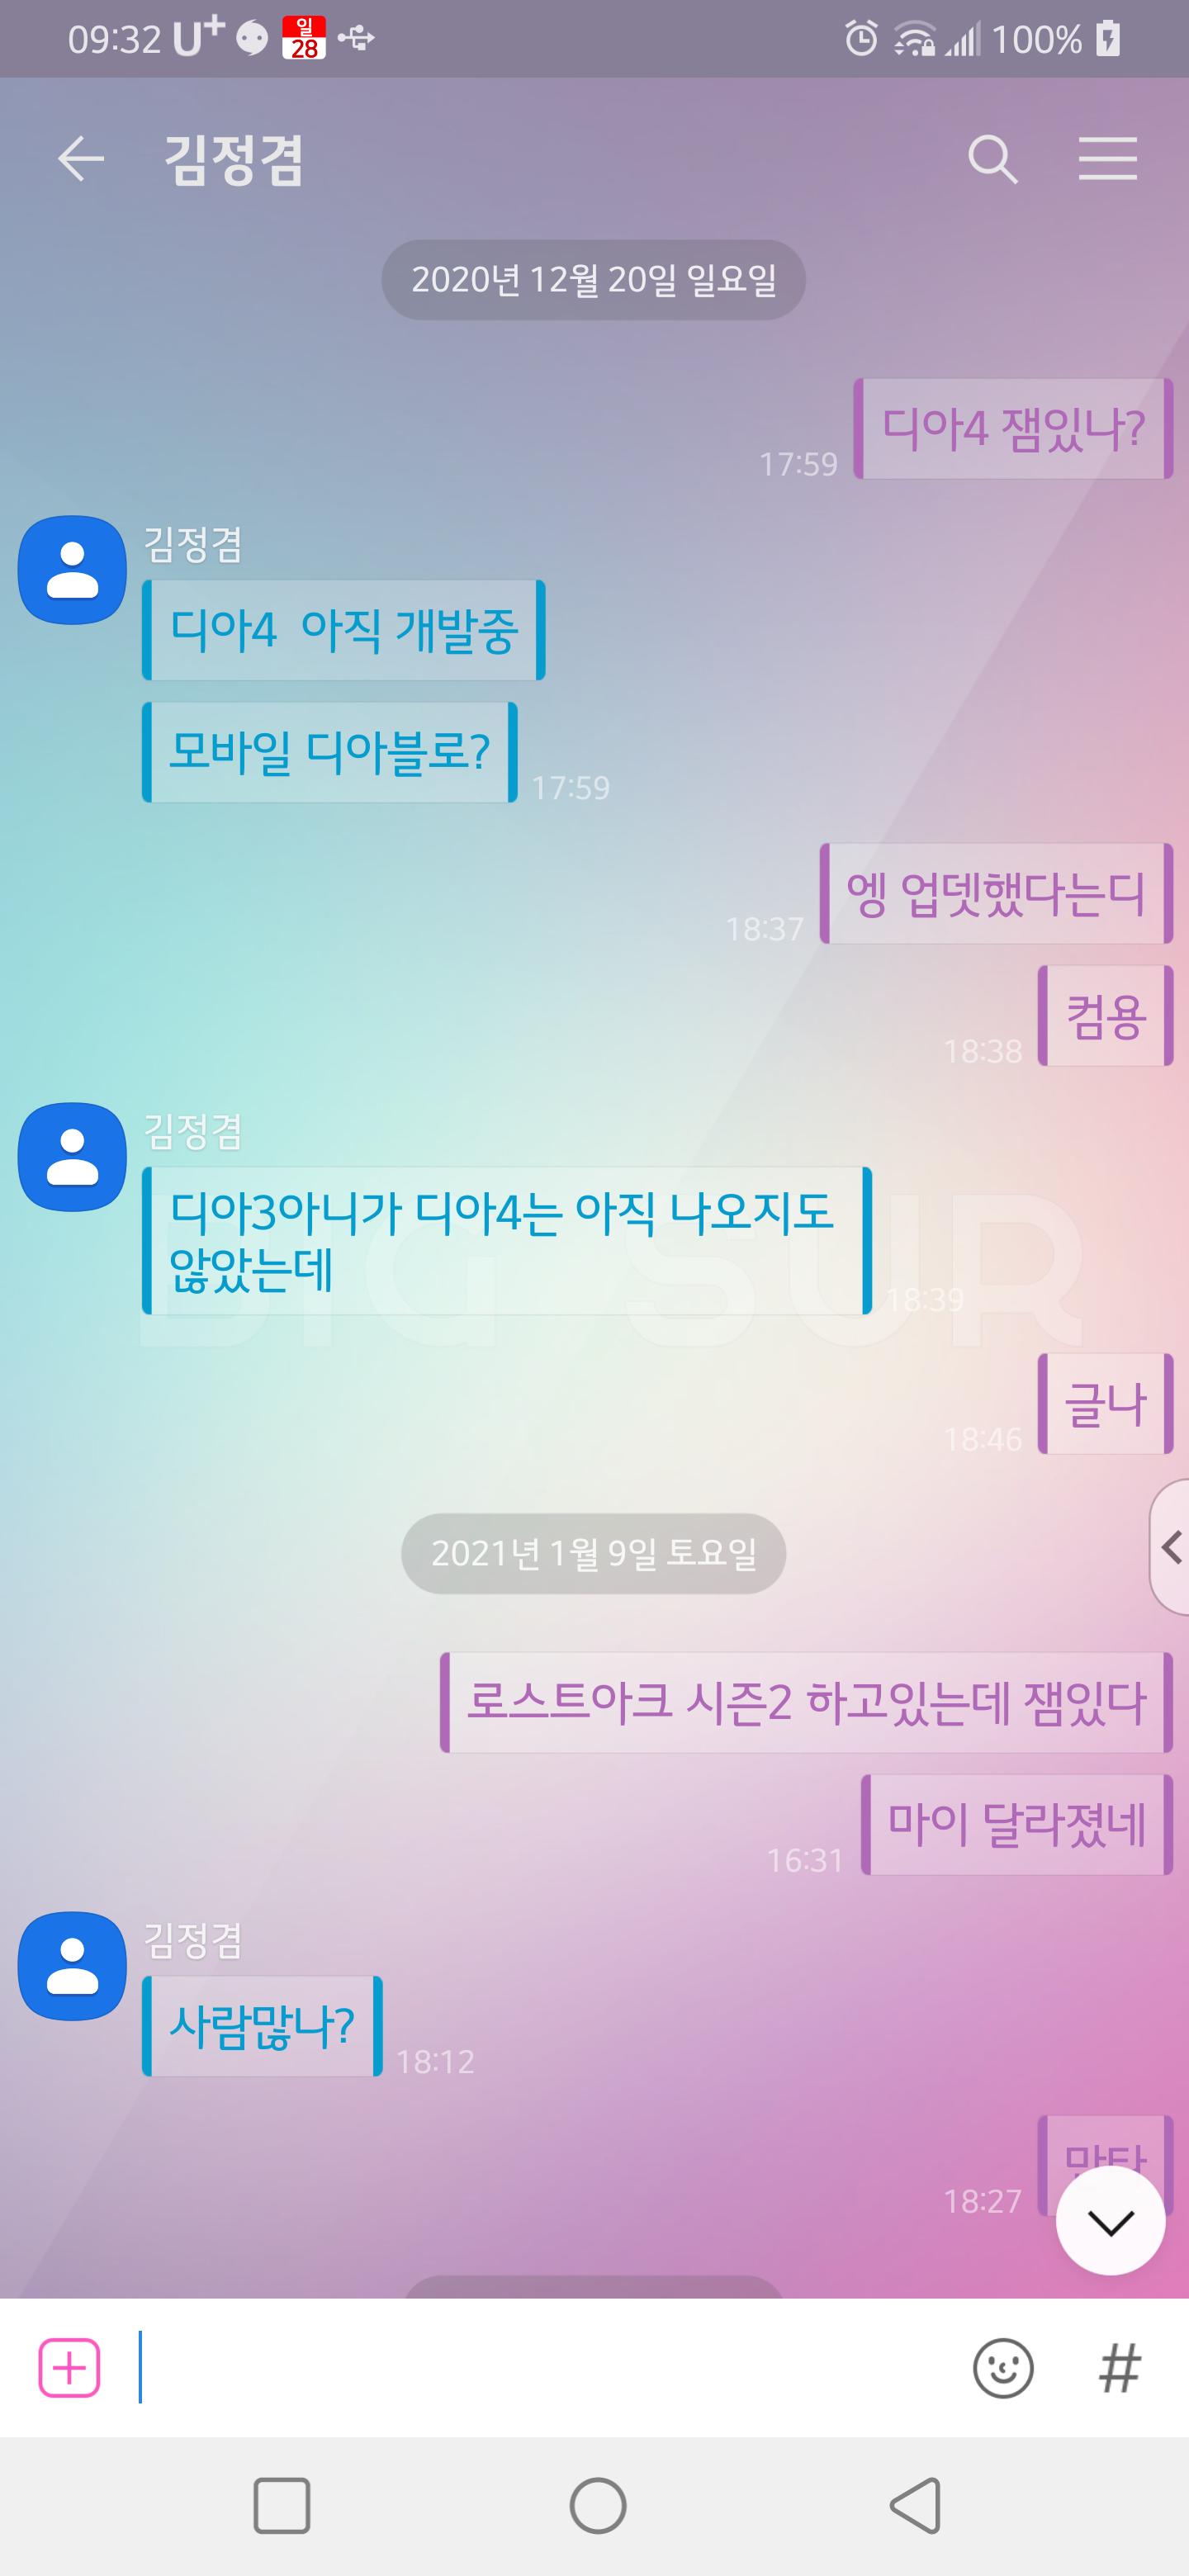 Screenshot_20210328-093234.png